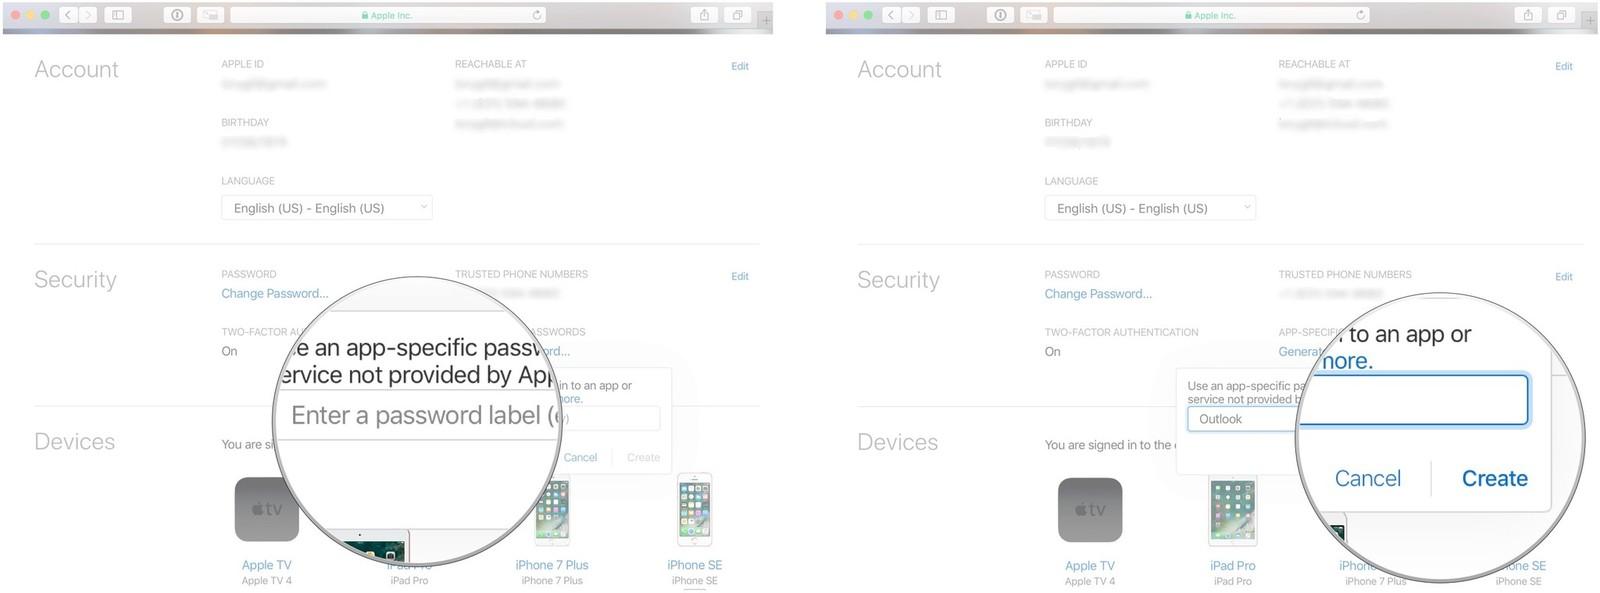 generate-app-specific-password-02.jpg